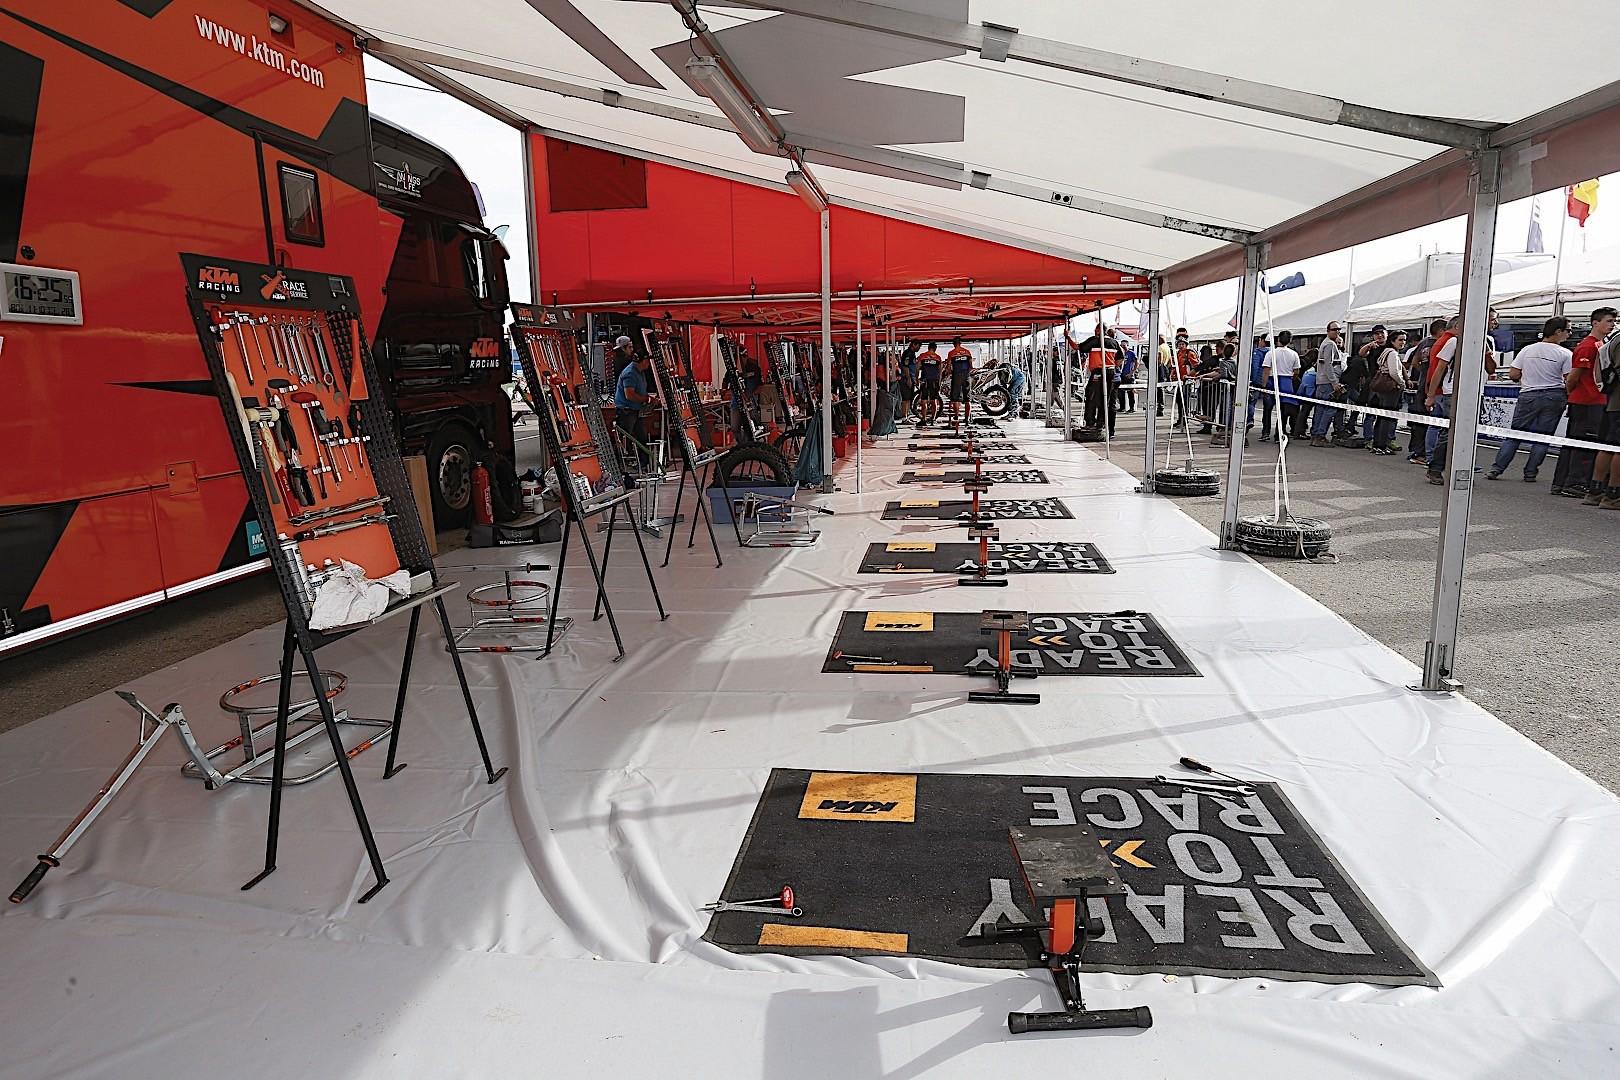 World superbike considering supersport 300 racing series